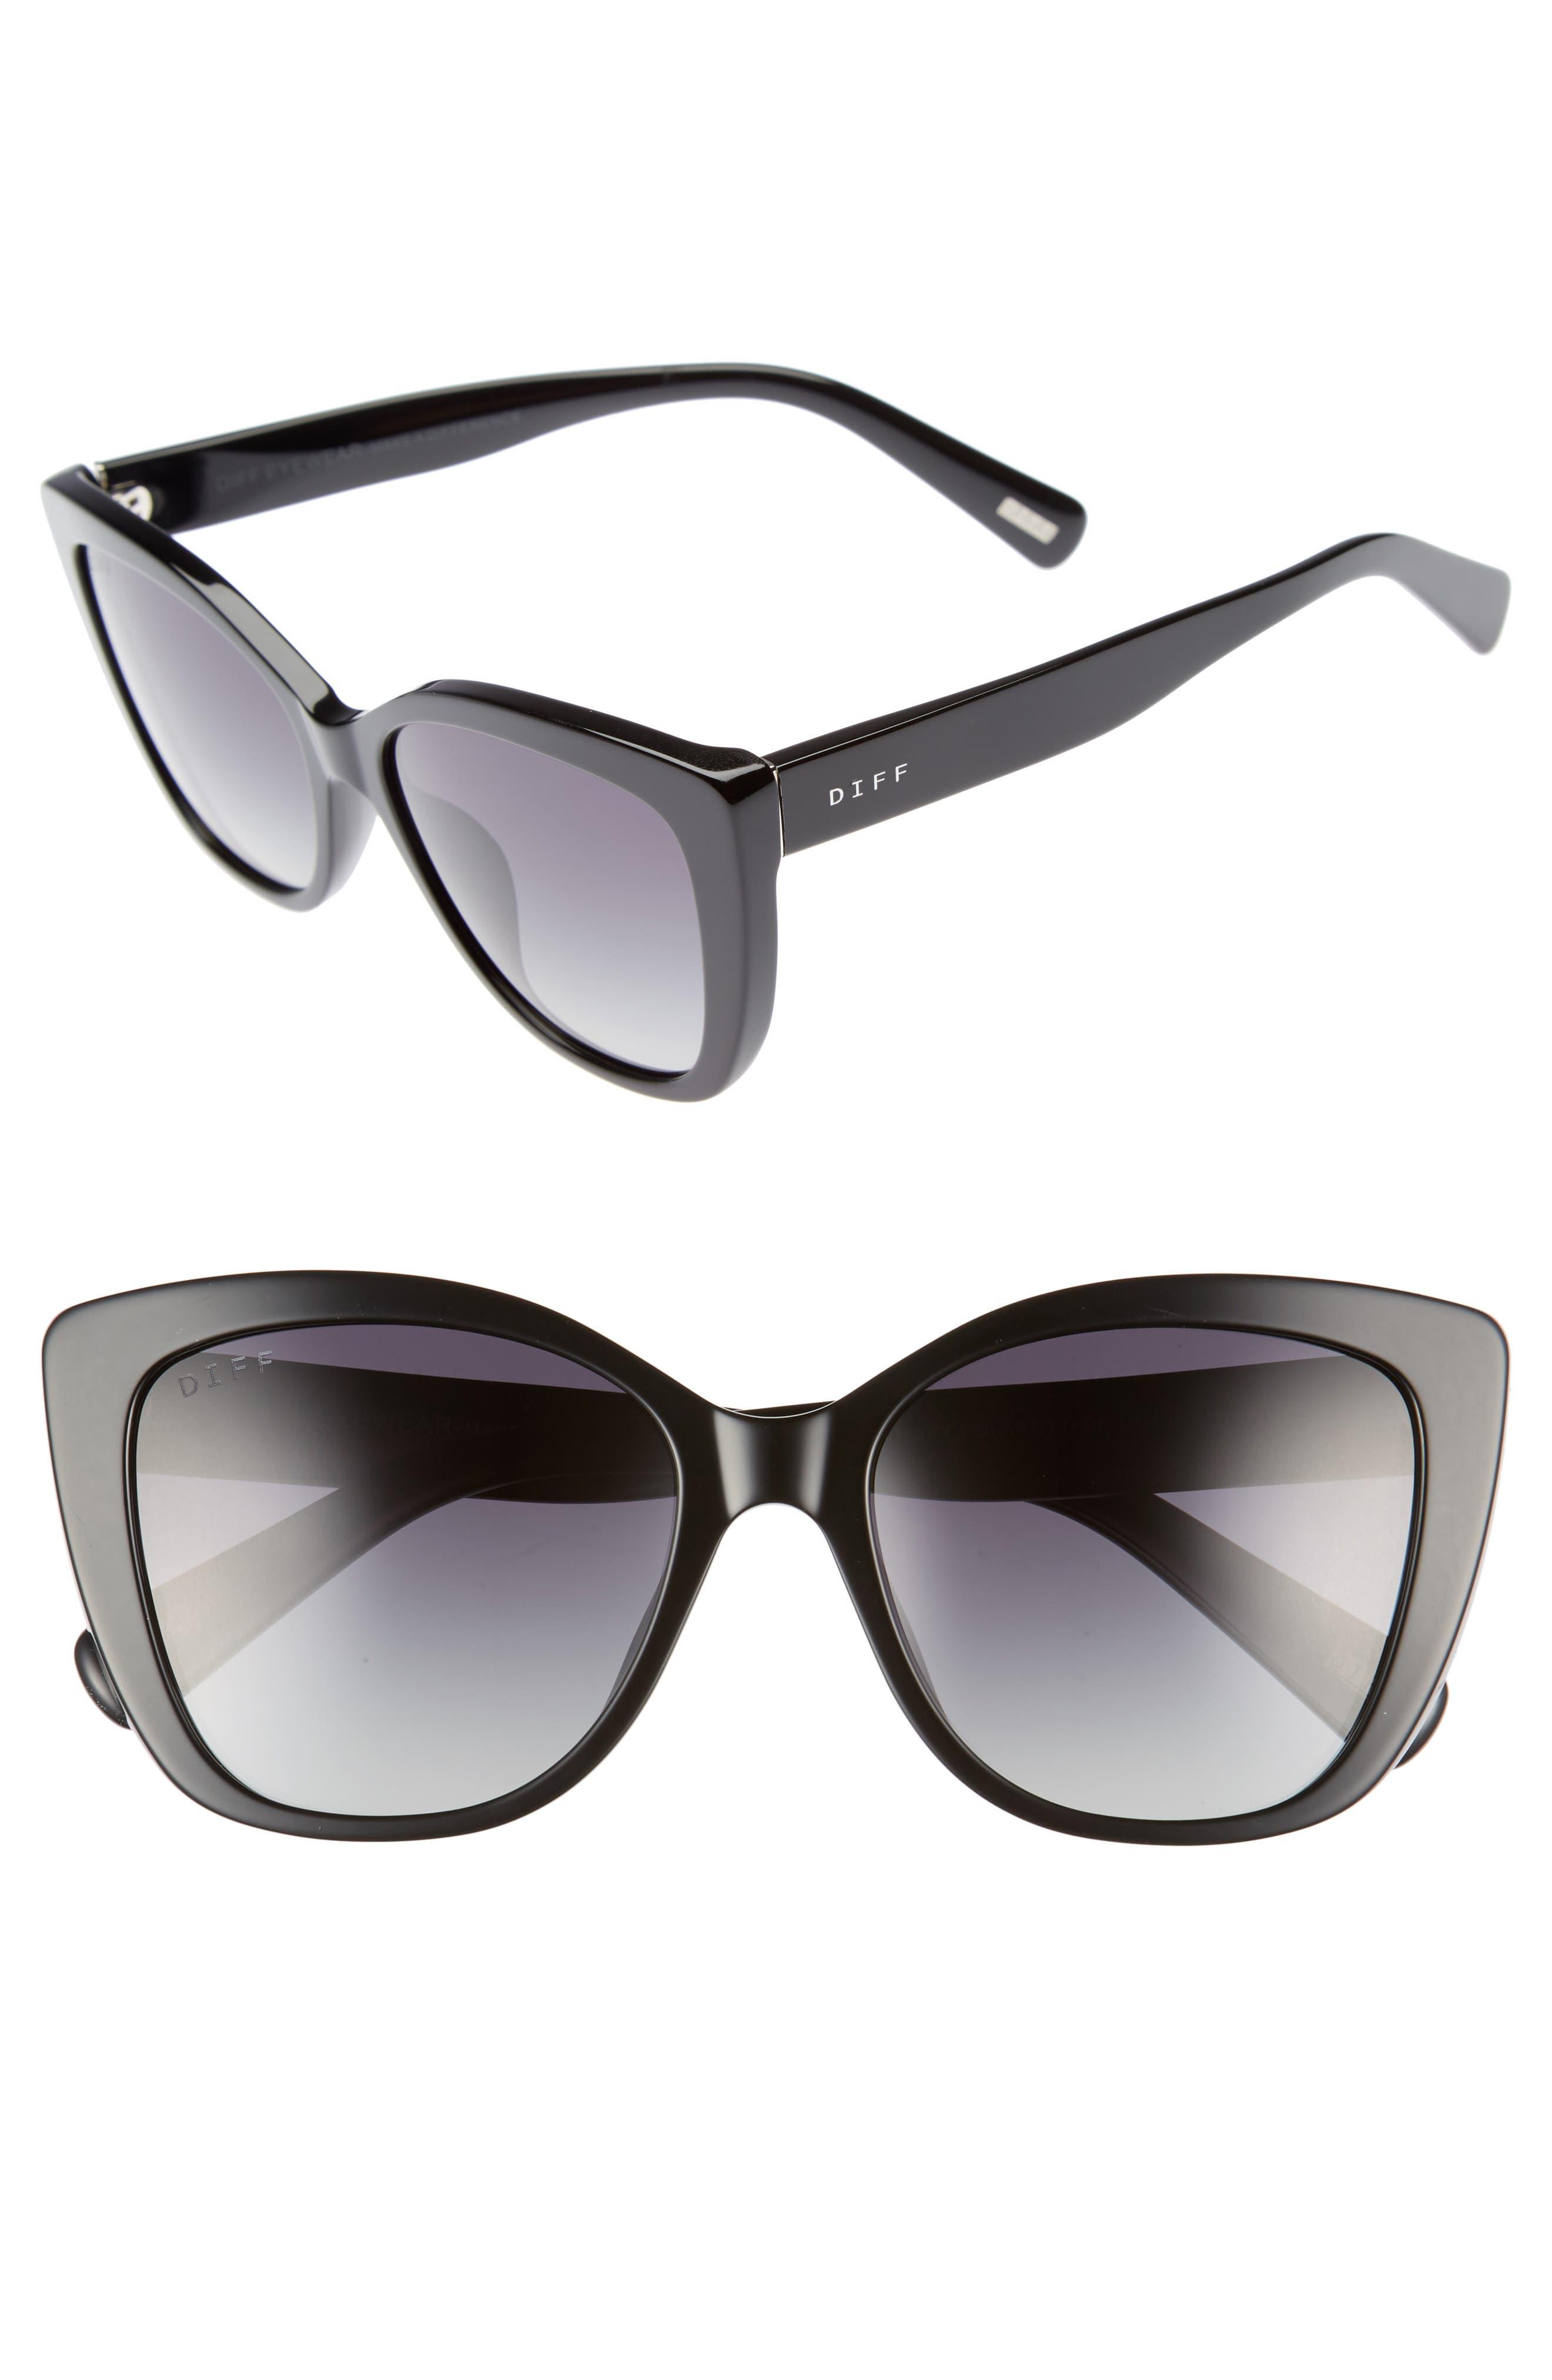 Main Image - DIFF Ruby 54mm Polarized Sunglasses